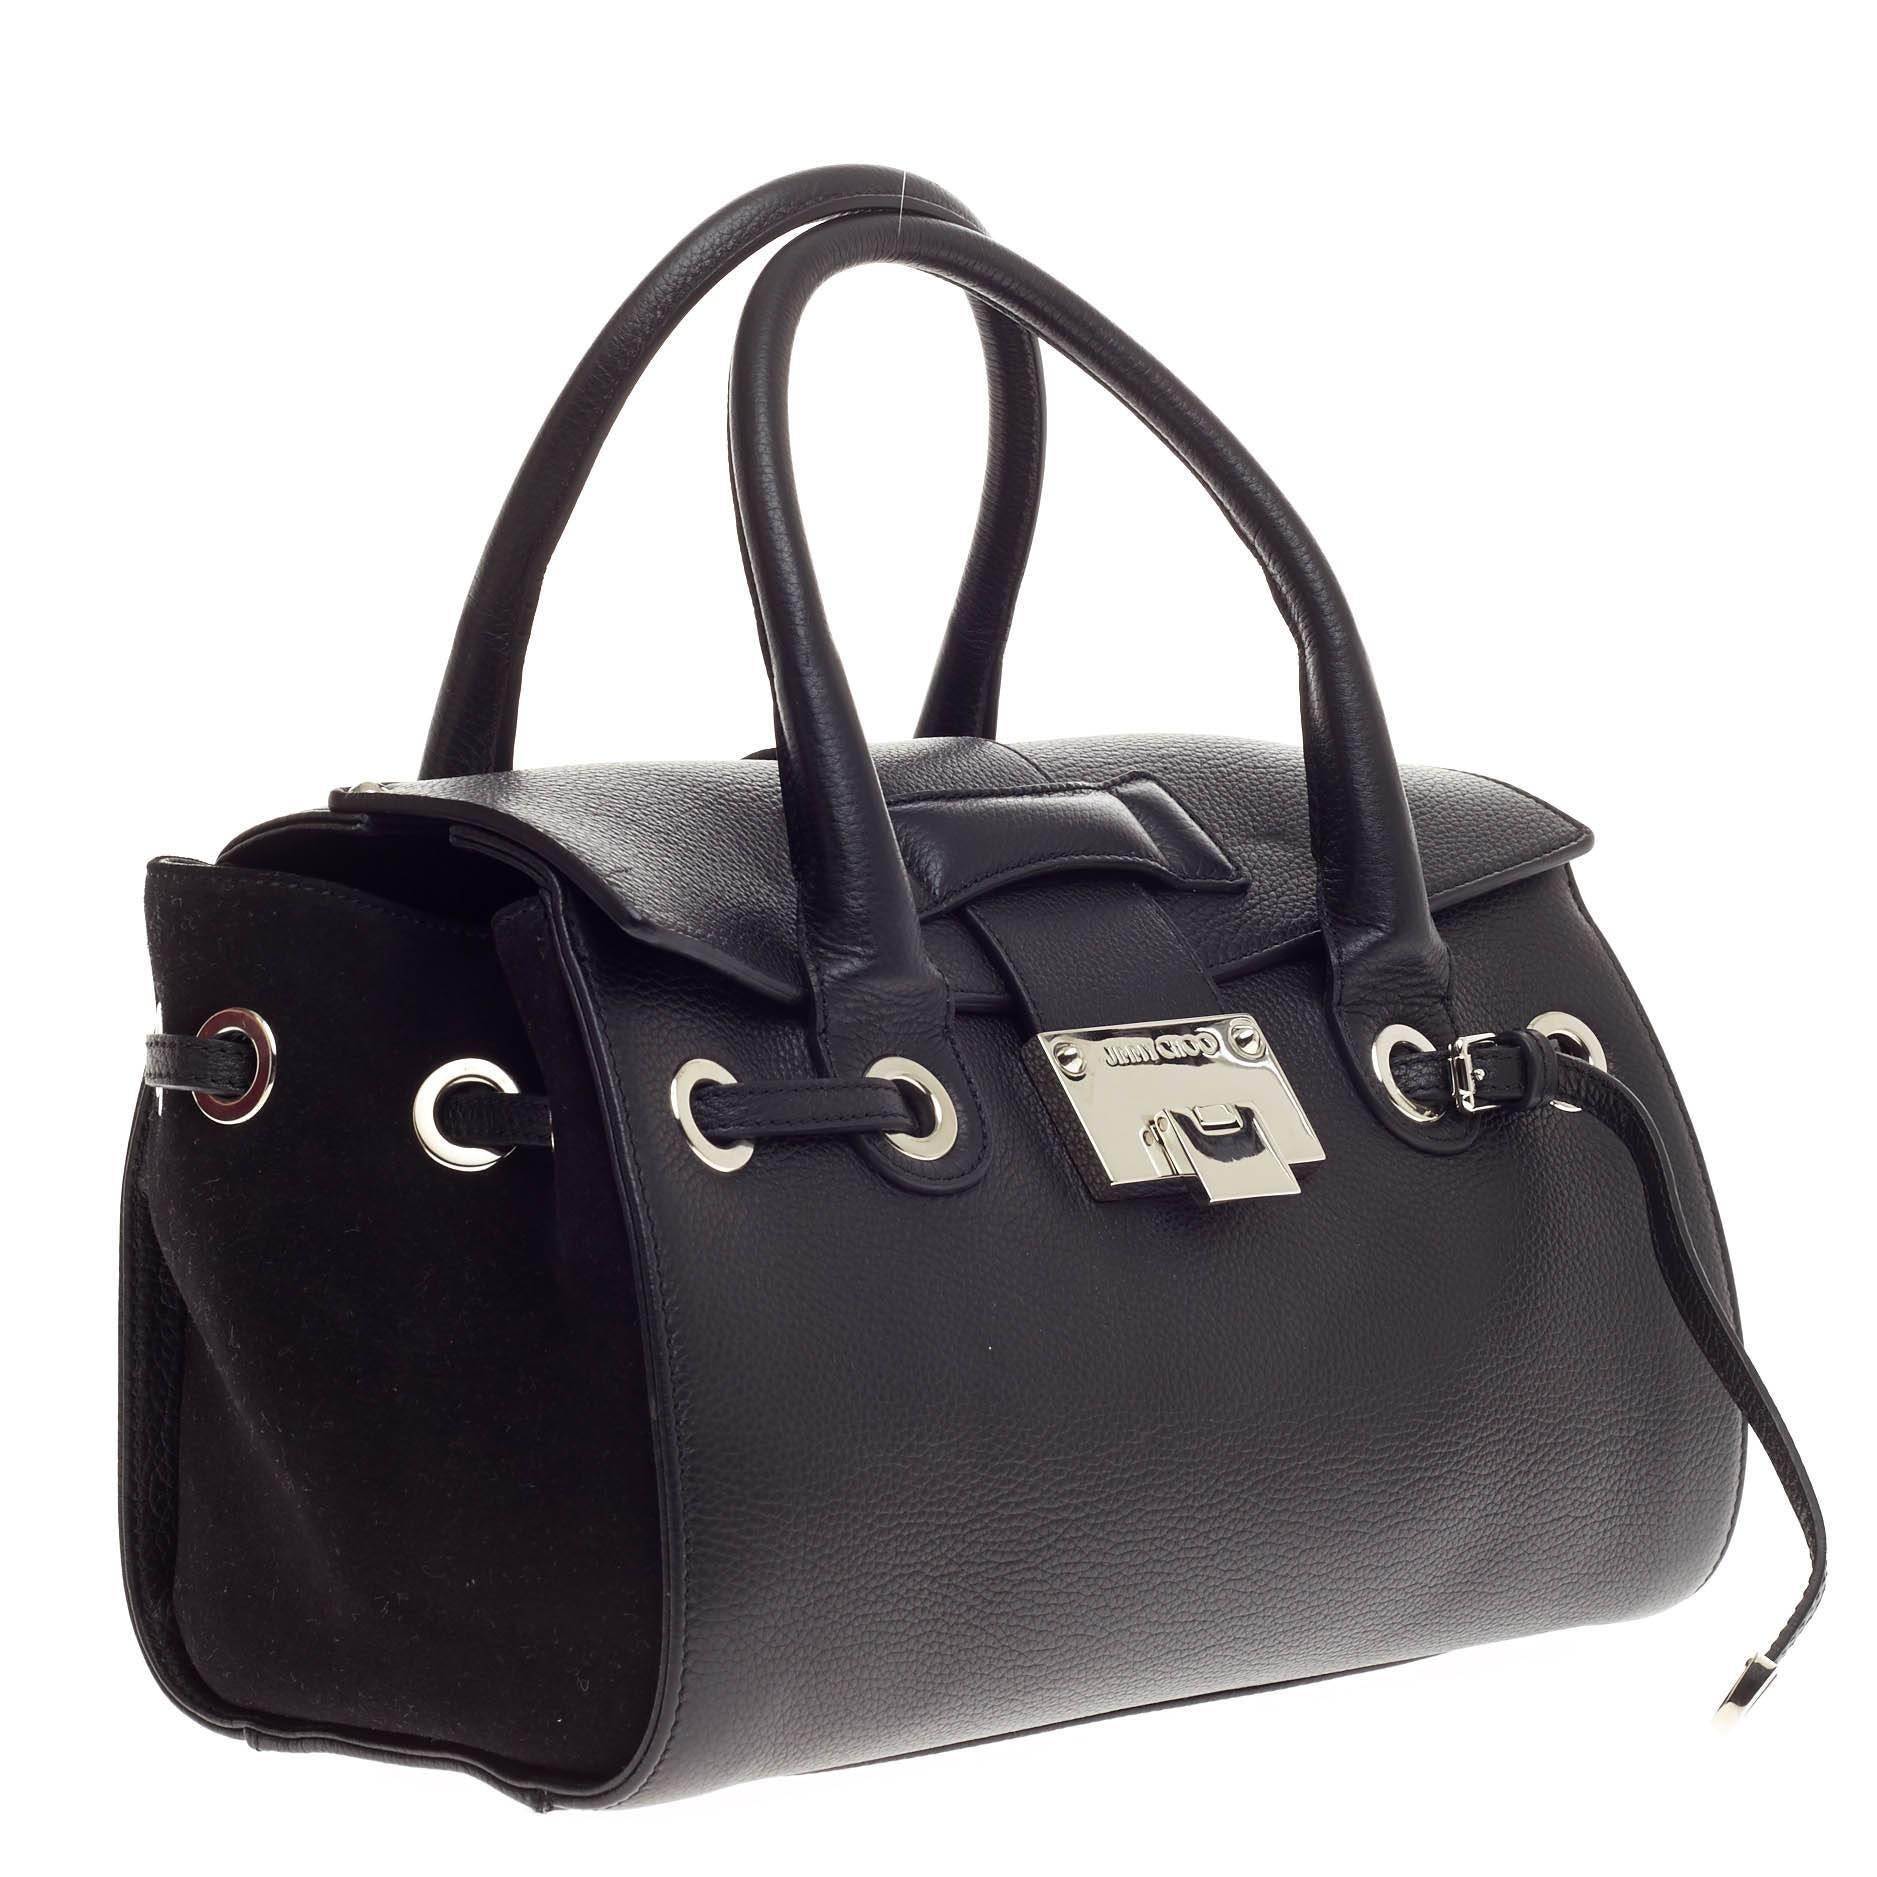 7bbaf6c1c624 Jimmy Choo Rosalie Convertible Satchel Leather Small at 1stdibs